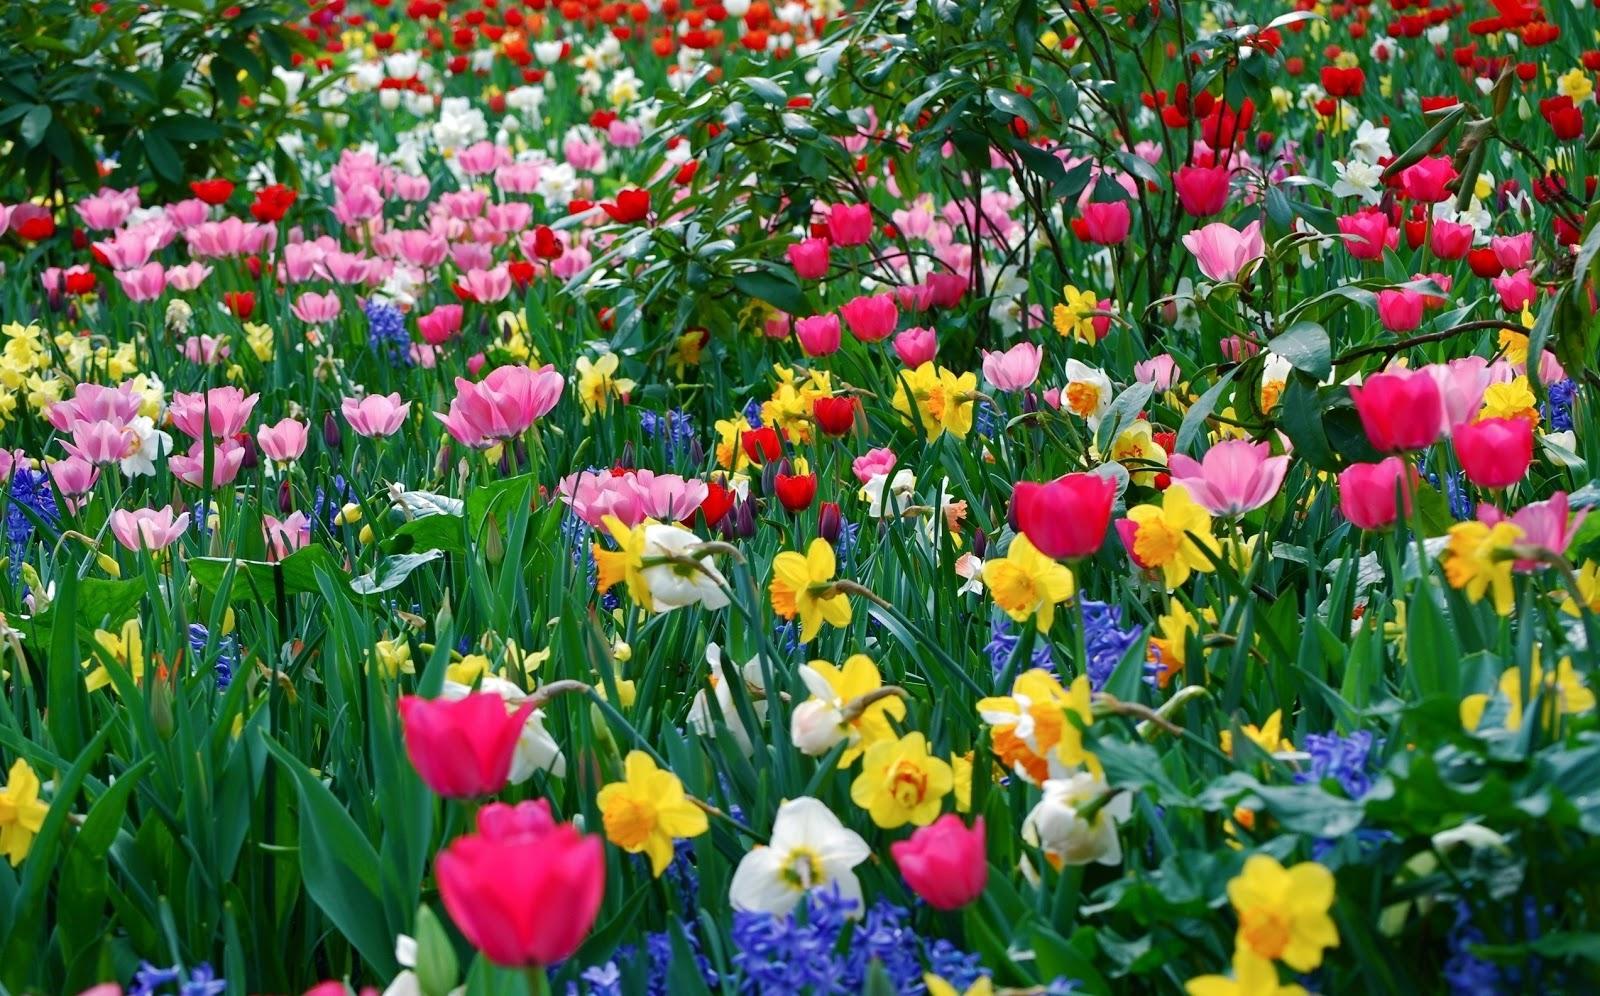 http://2.bp.blogspot.com/-40AJ3pjzpz8/ULdd1WazLKI/AAAAAAAAAnA/5juLrGQ7Hj8/s1600/achtergrond-met-bloemen-in-alle-kleuren.jpg